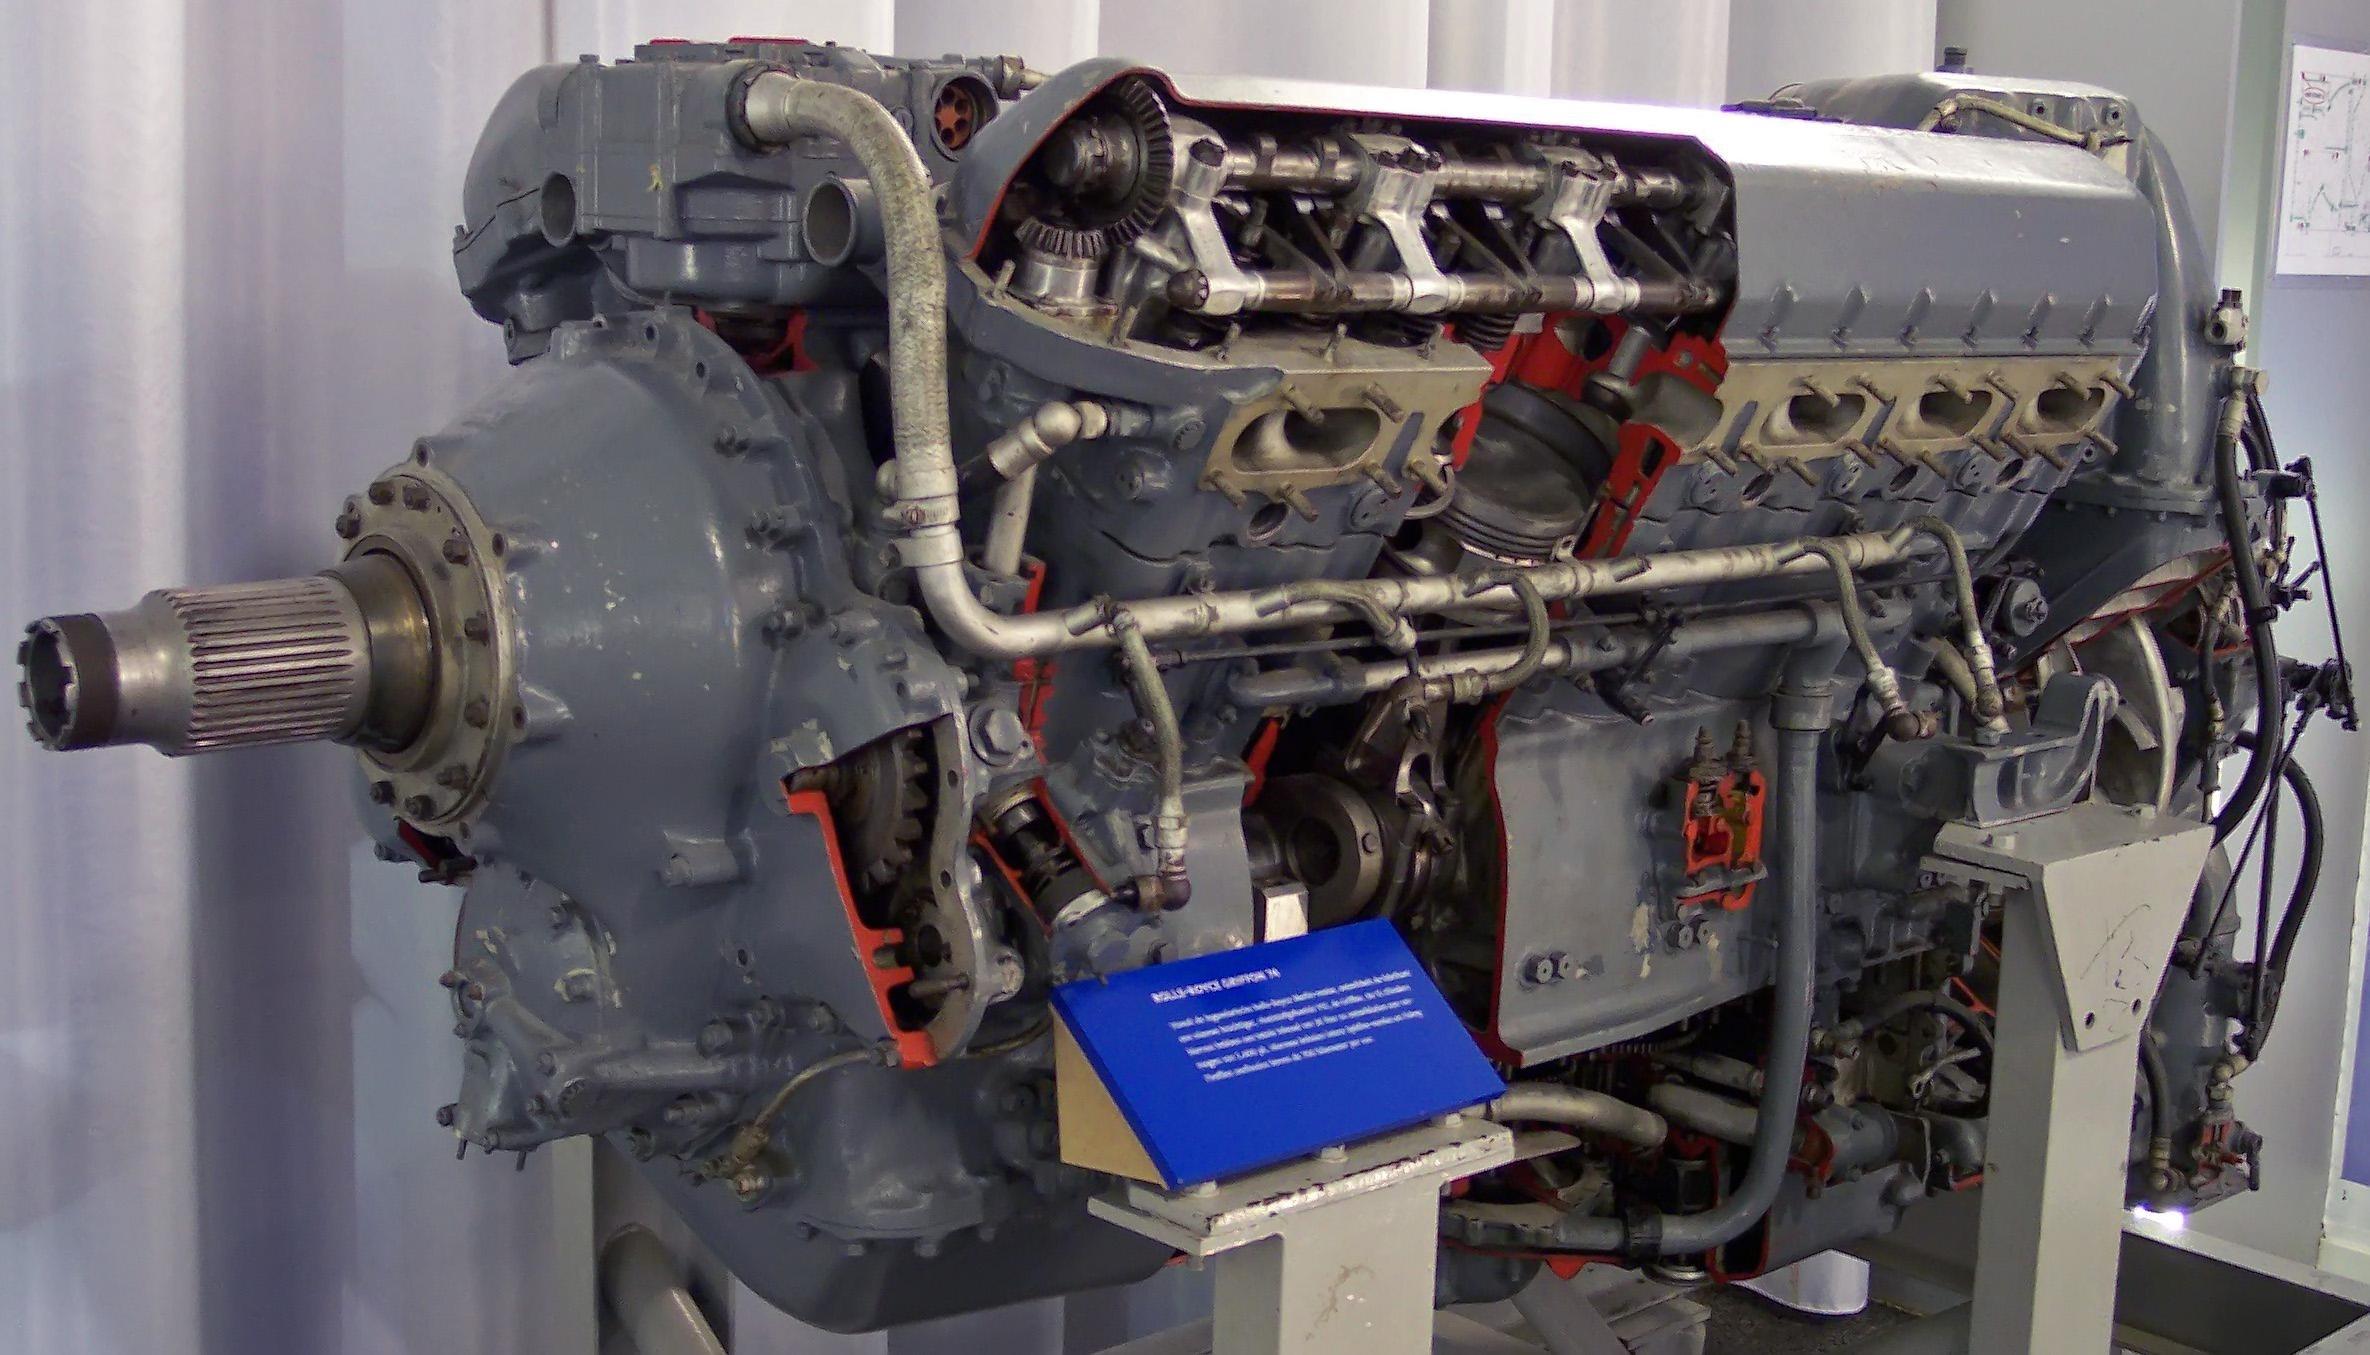 Rolls Royce Griffon Wikipedia 2011 Mustang Power Seat Wiring Diagram